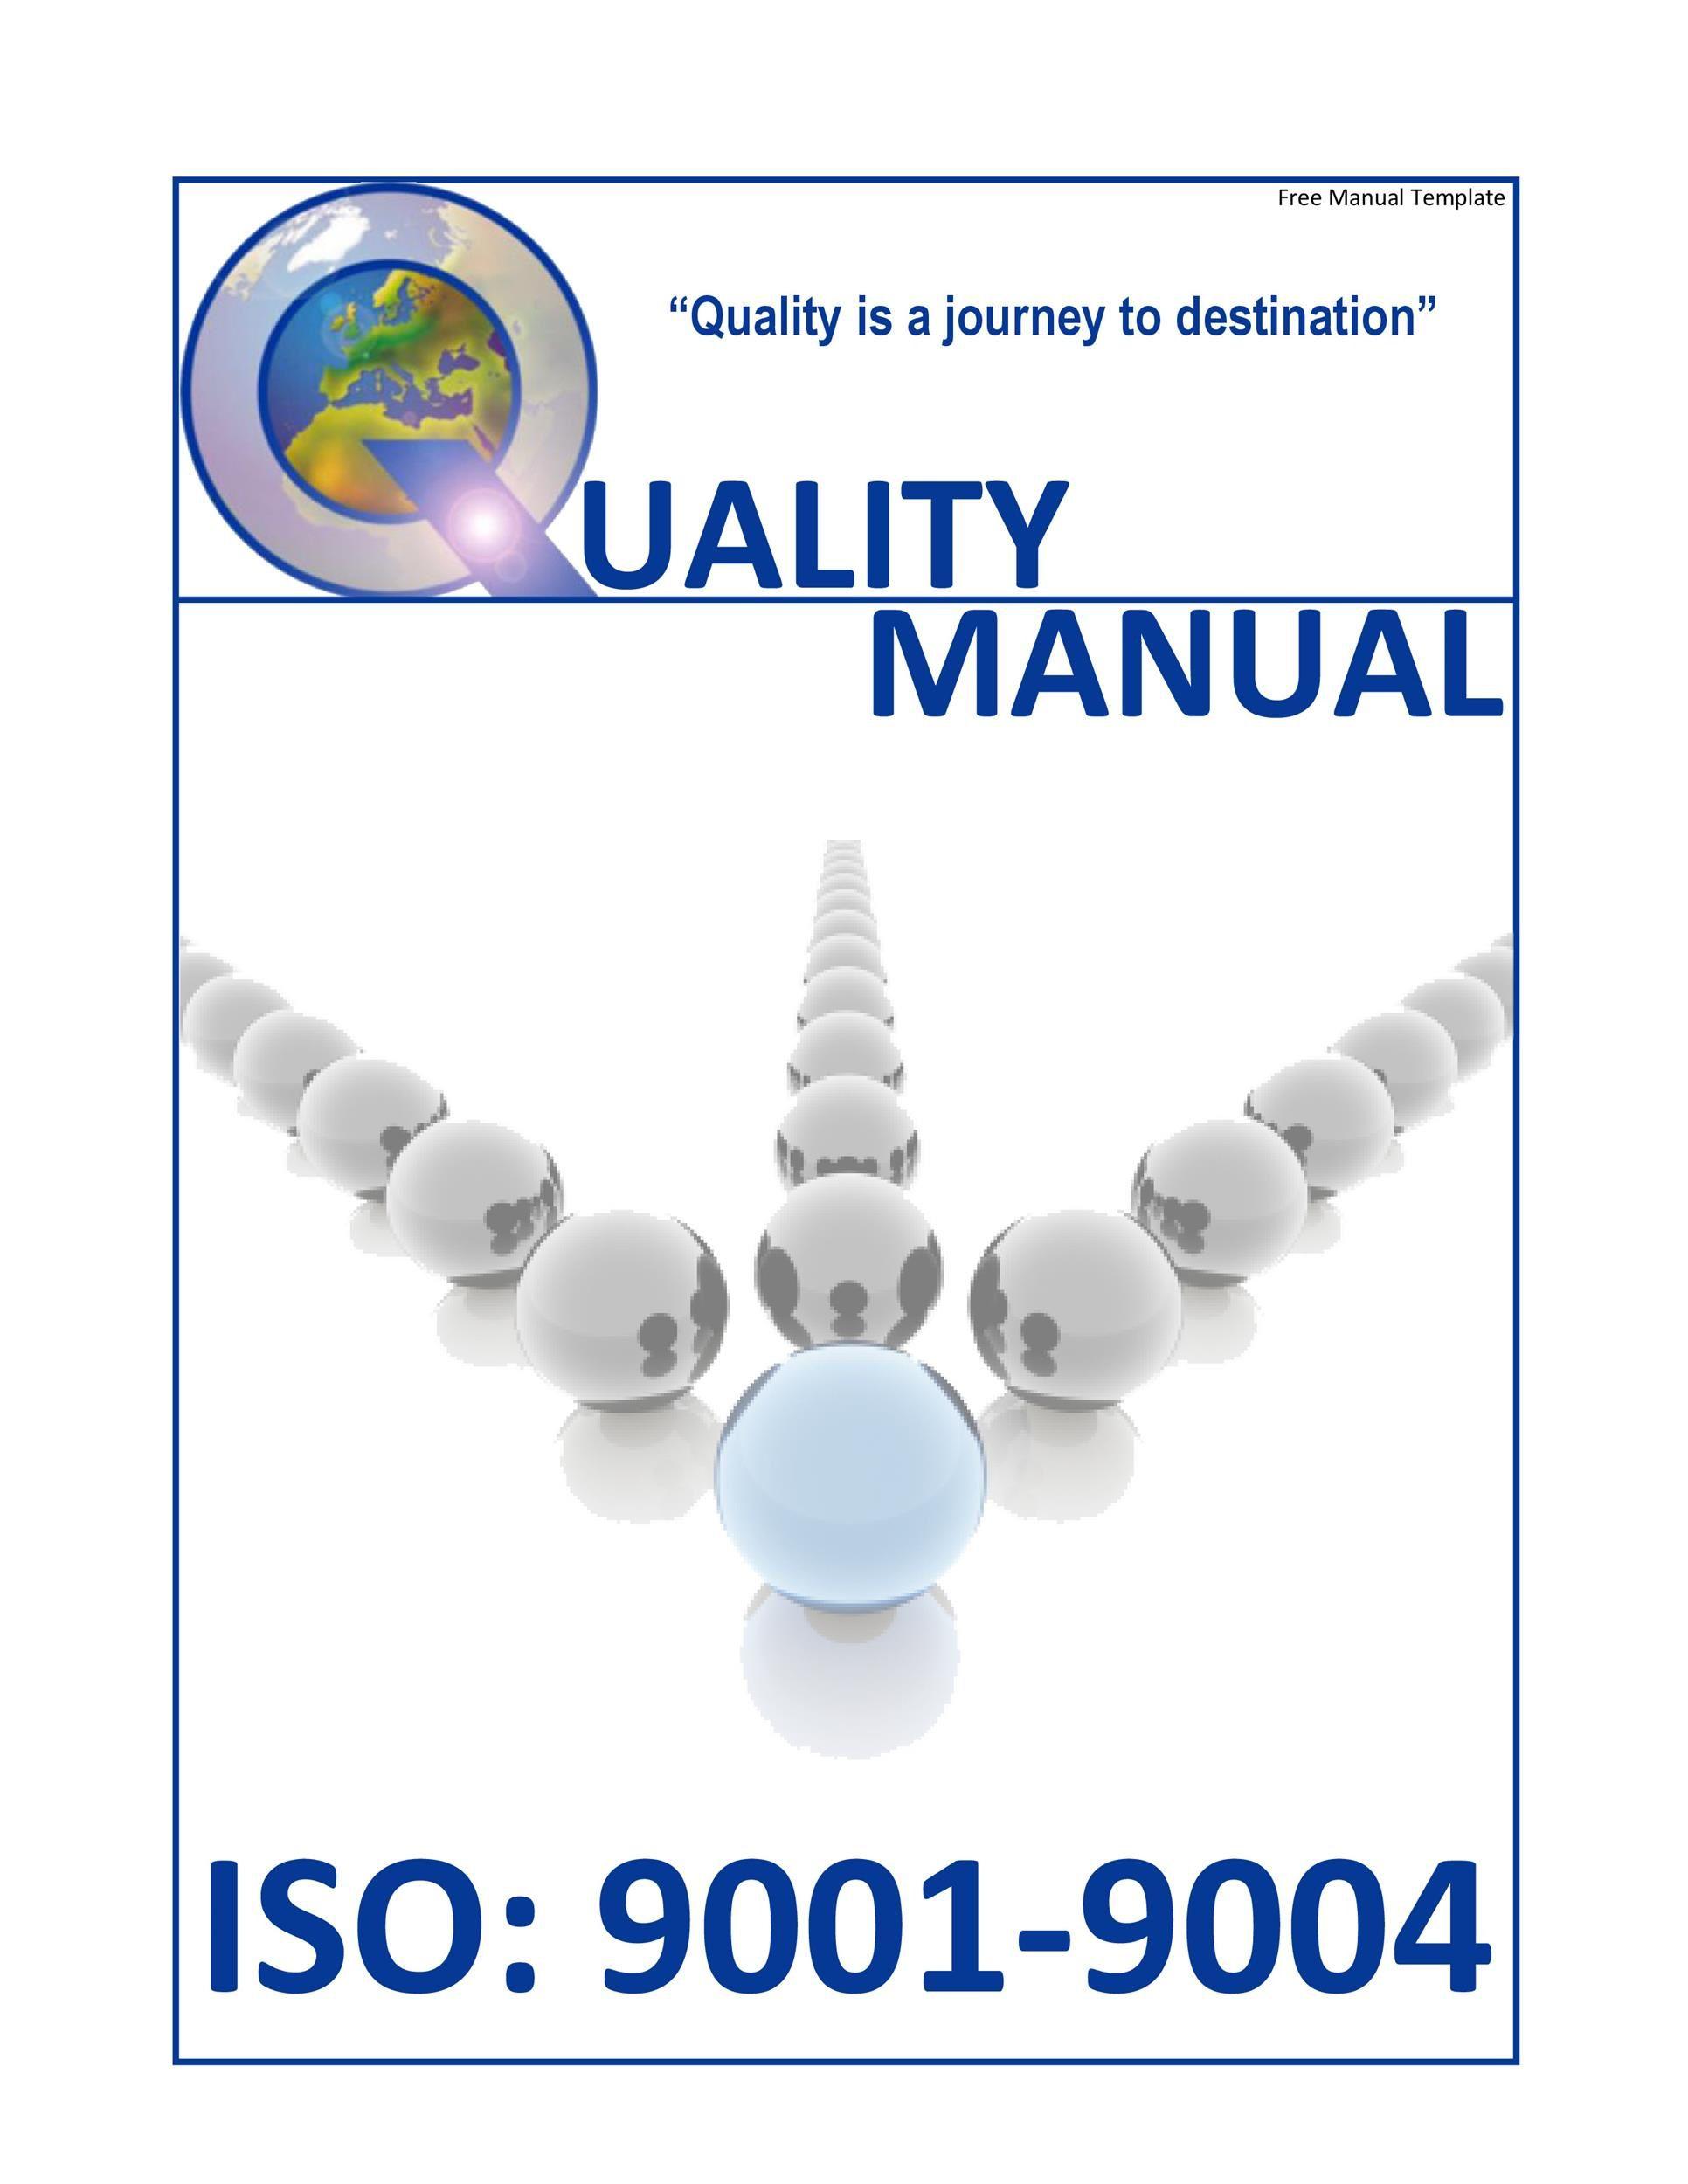 005 Unbelievable Free Employee Handbook Template Word High Resolution  Sample In Training ManualFull